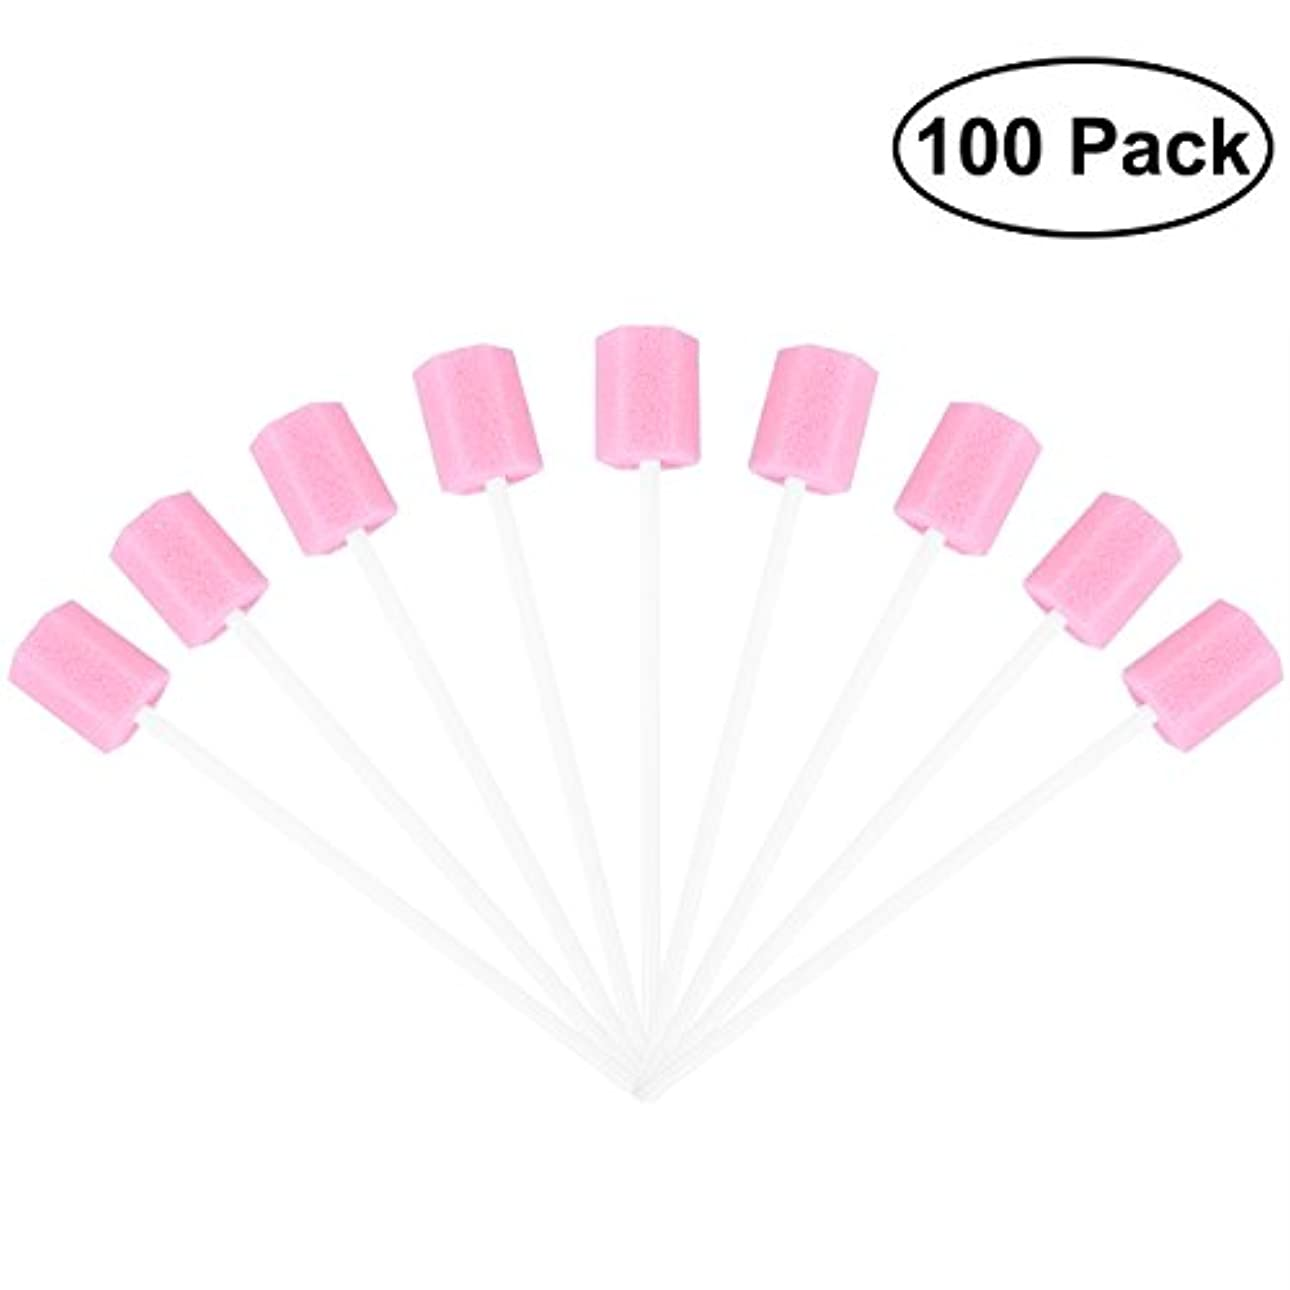 ROSENICE 使い捨てオーラルケアスポンジスワブ歯口洗浄スワブ100個(ピンク)